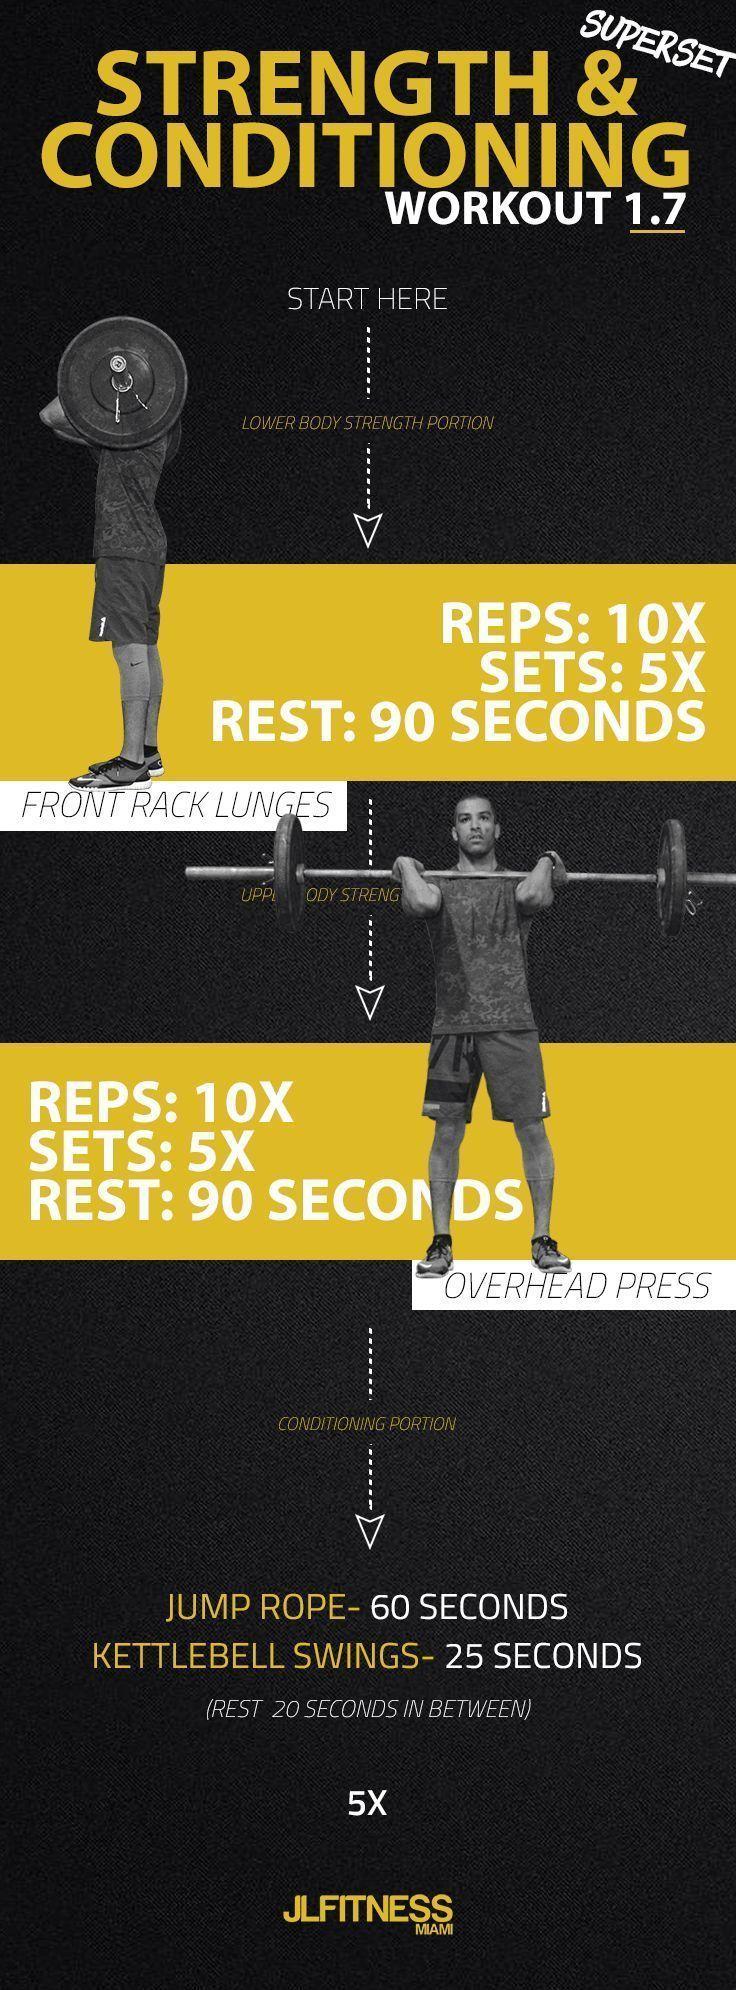 #barbel #body #fitness #fitnessstudio #fitnessstudio preisvergleich #Heres #preisvergleich #barbel #...